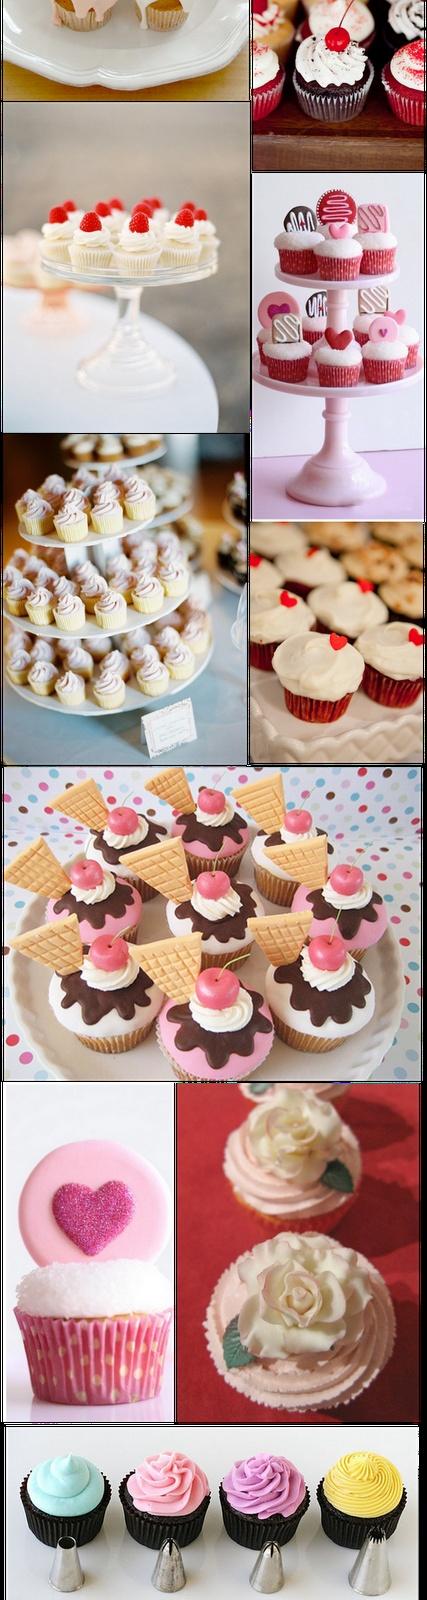 - Bodas Colorín Colorado -: - Cupcakes de Cuento